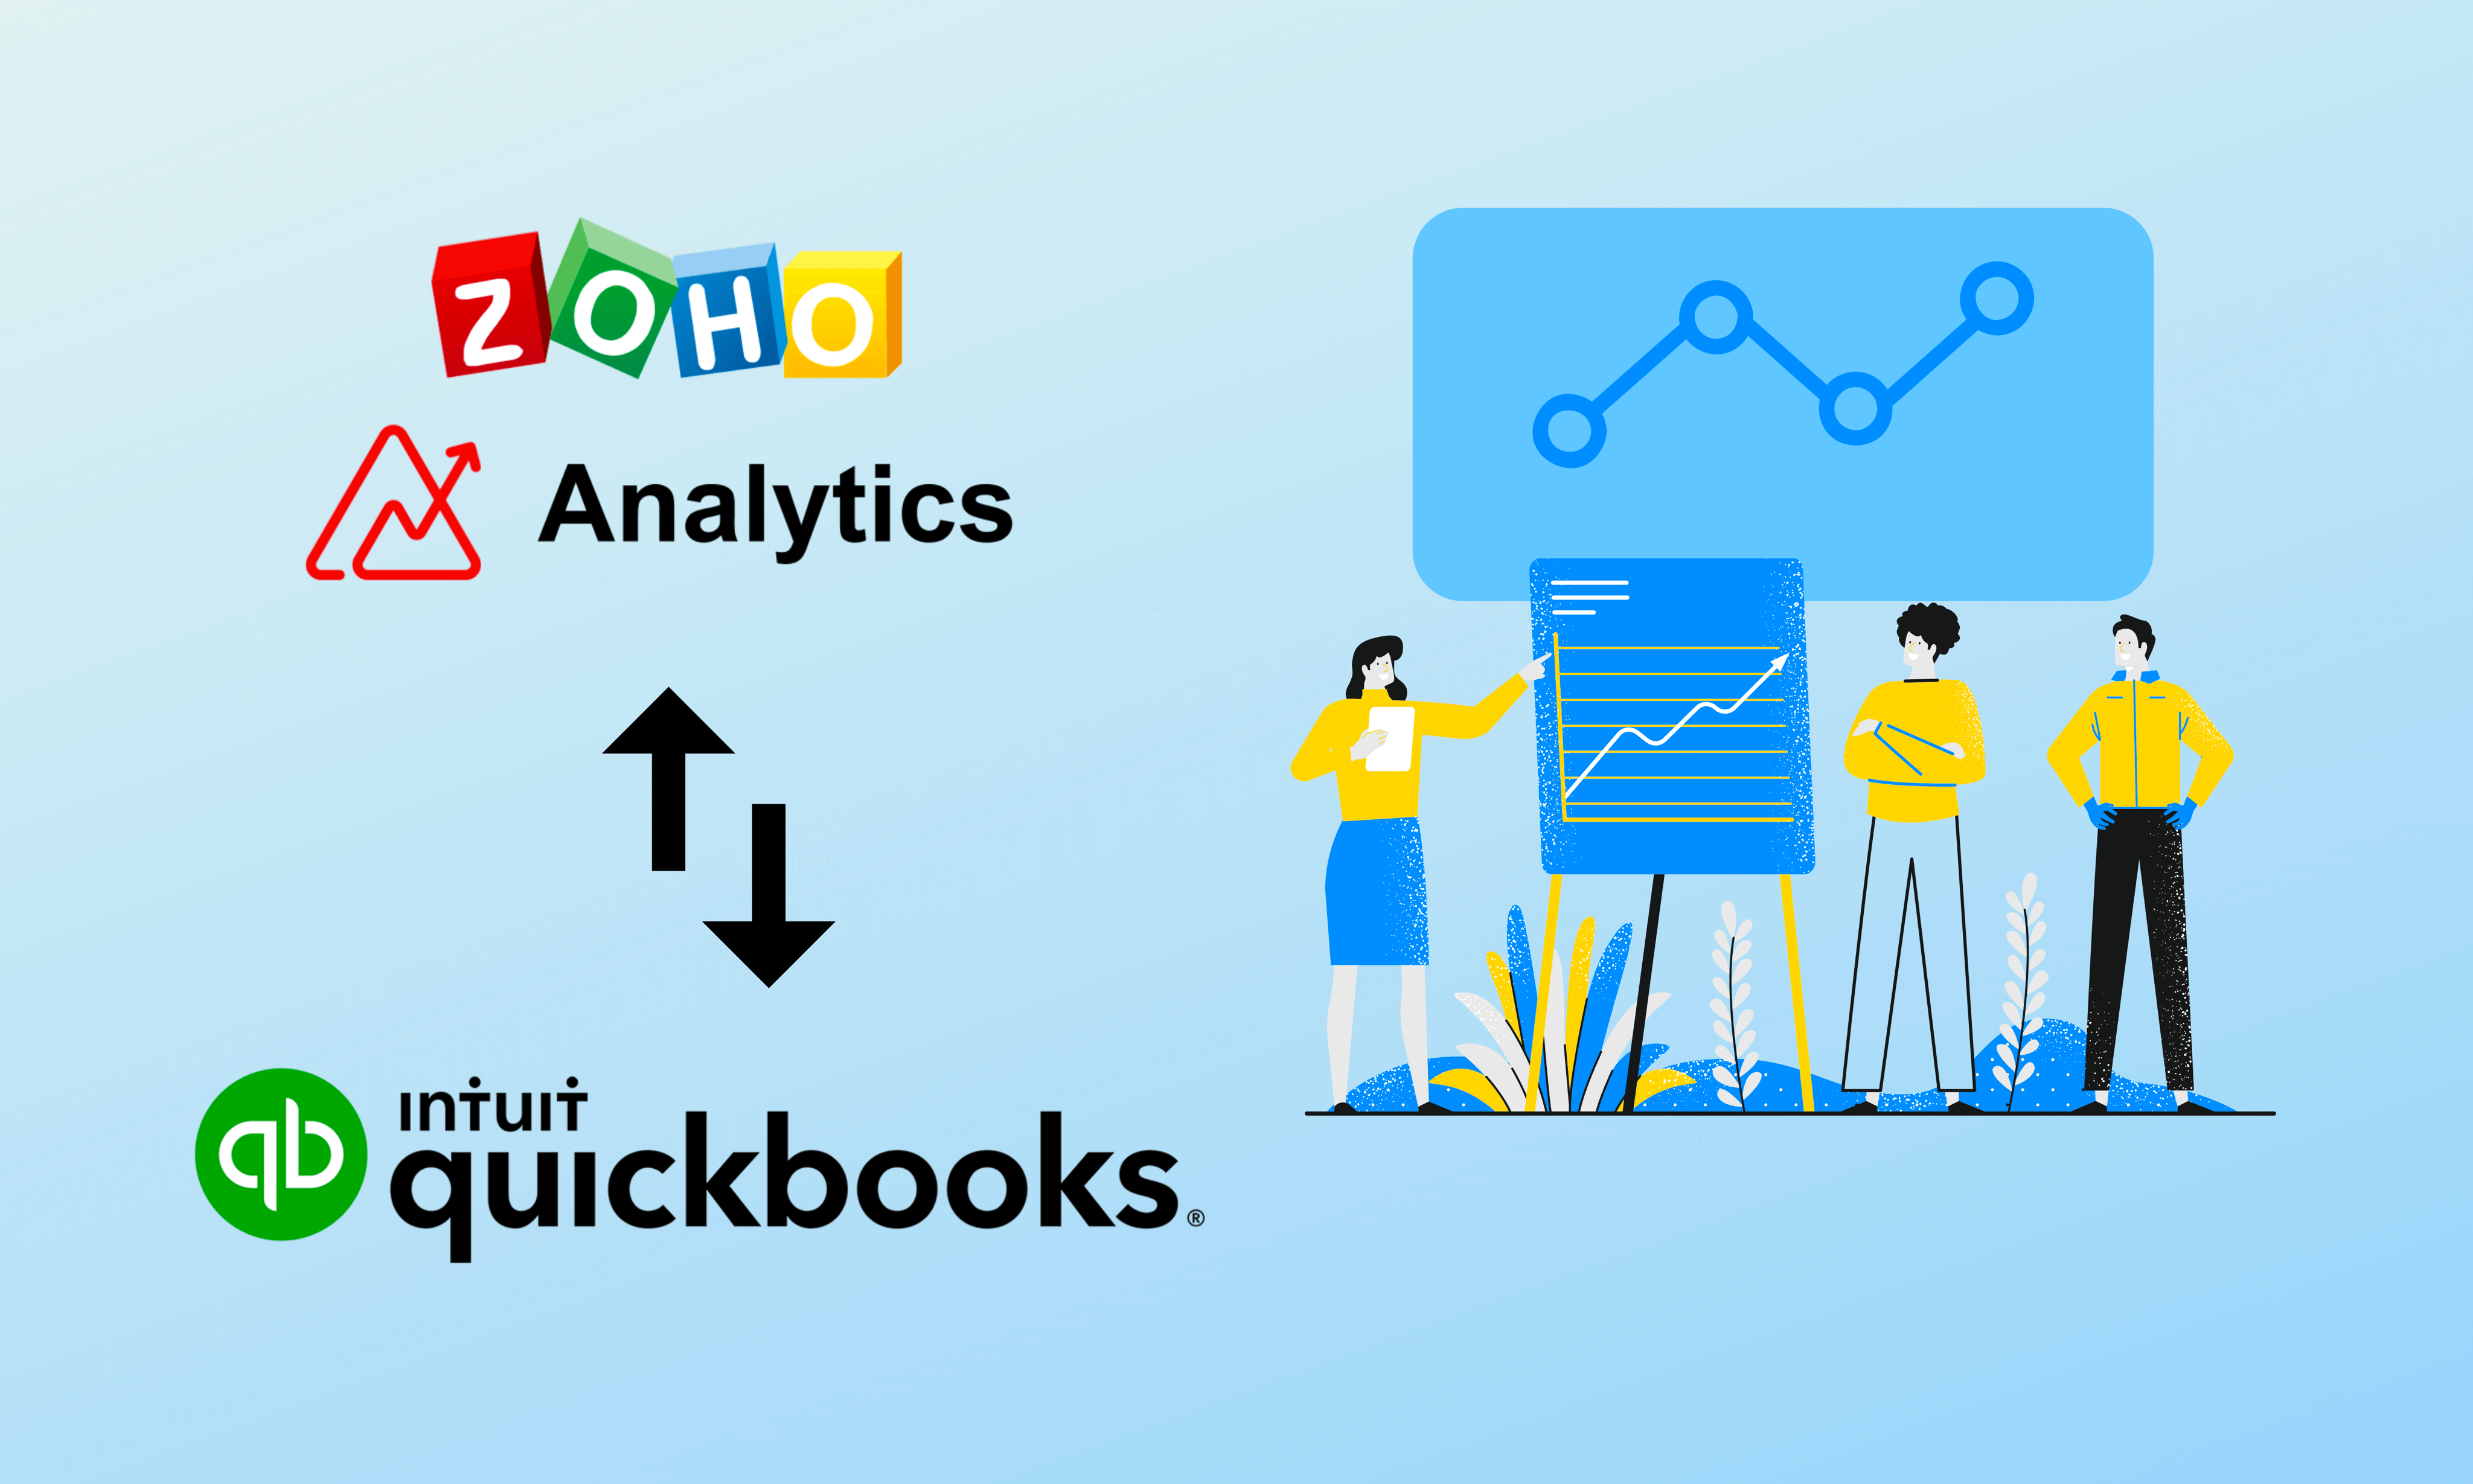 Zoho Analytics and QuickBooks Integration